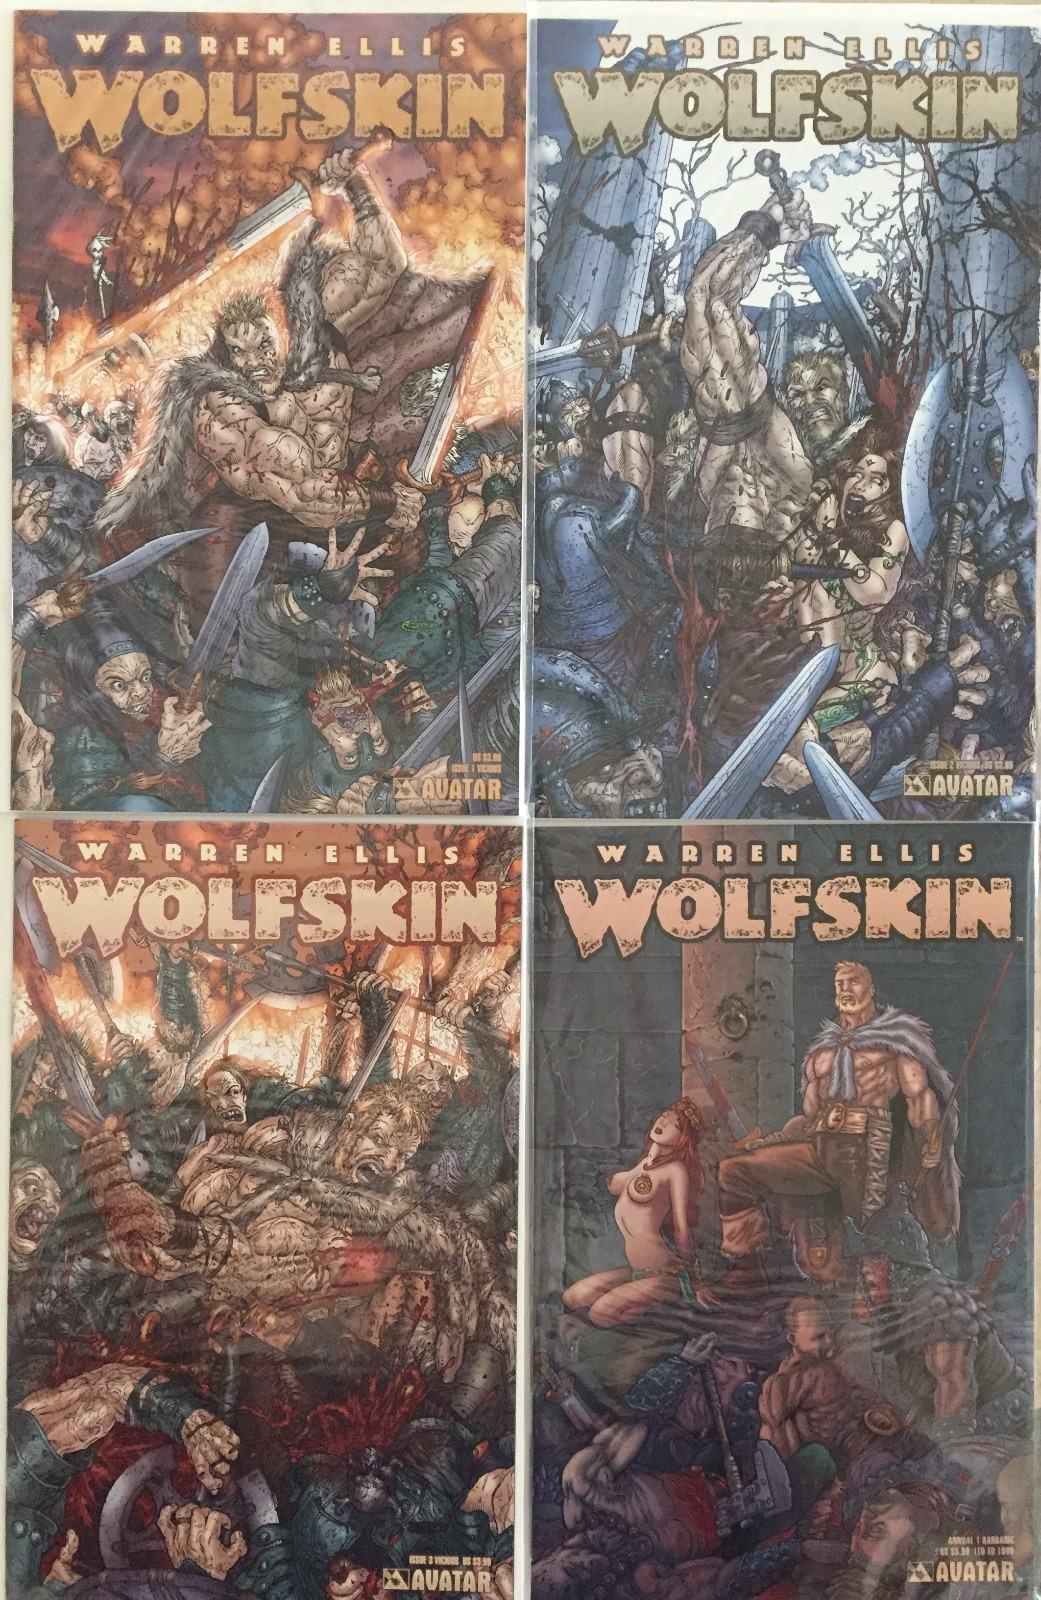 Wolfskin first Series, Avatar Press, 2006-2007  - $12.00